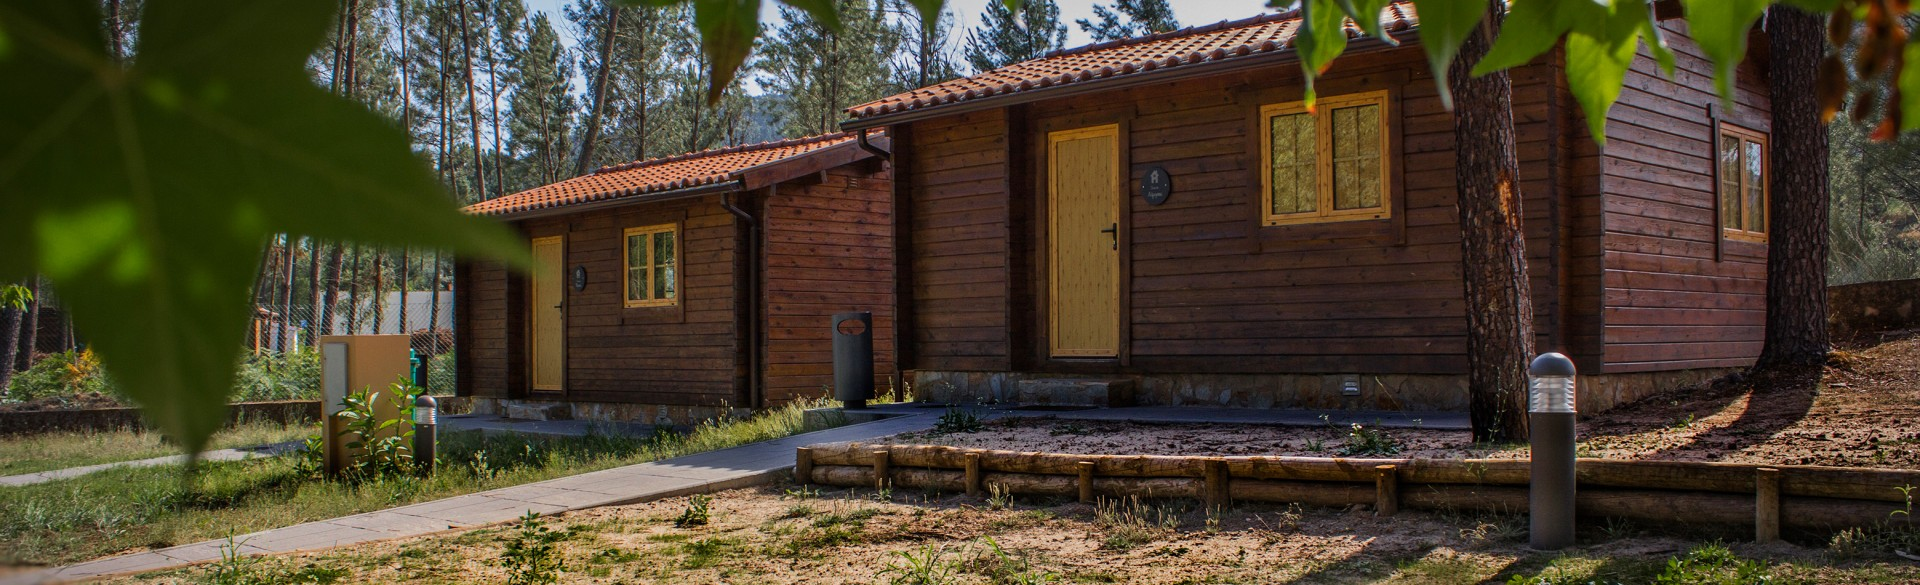 Casa da Alfazema - Xisto Camping